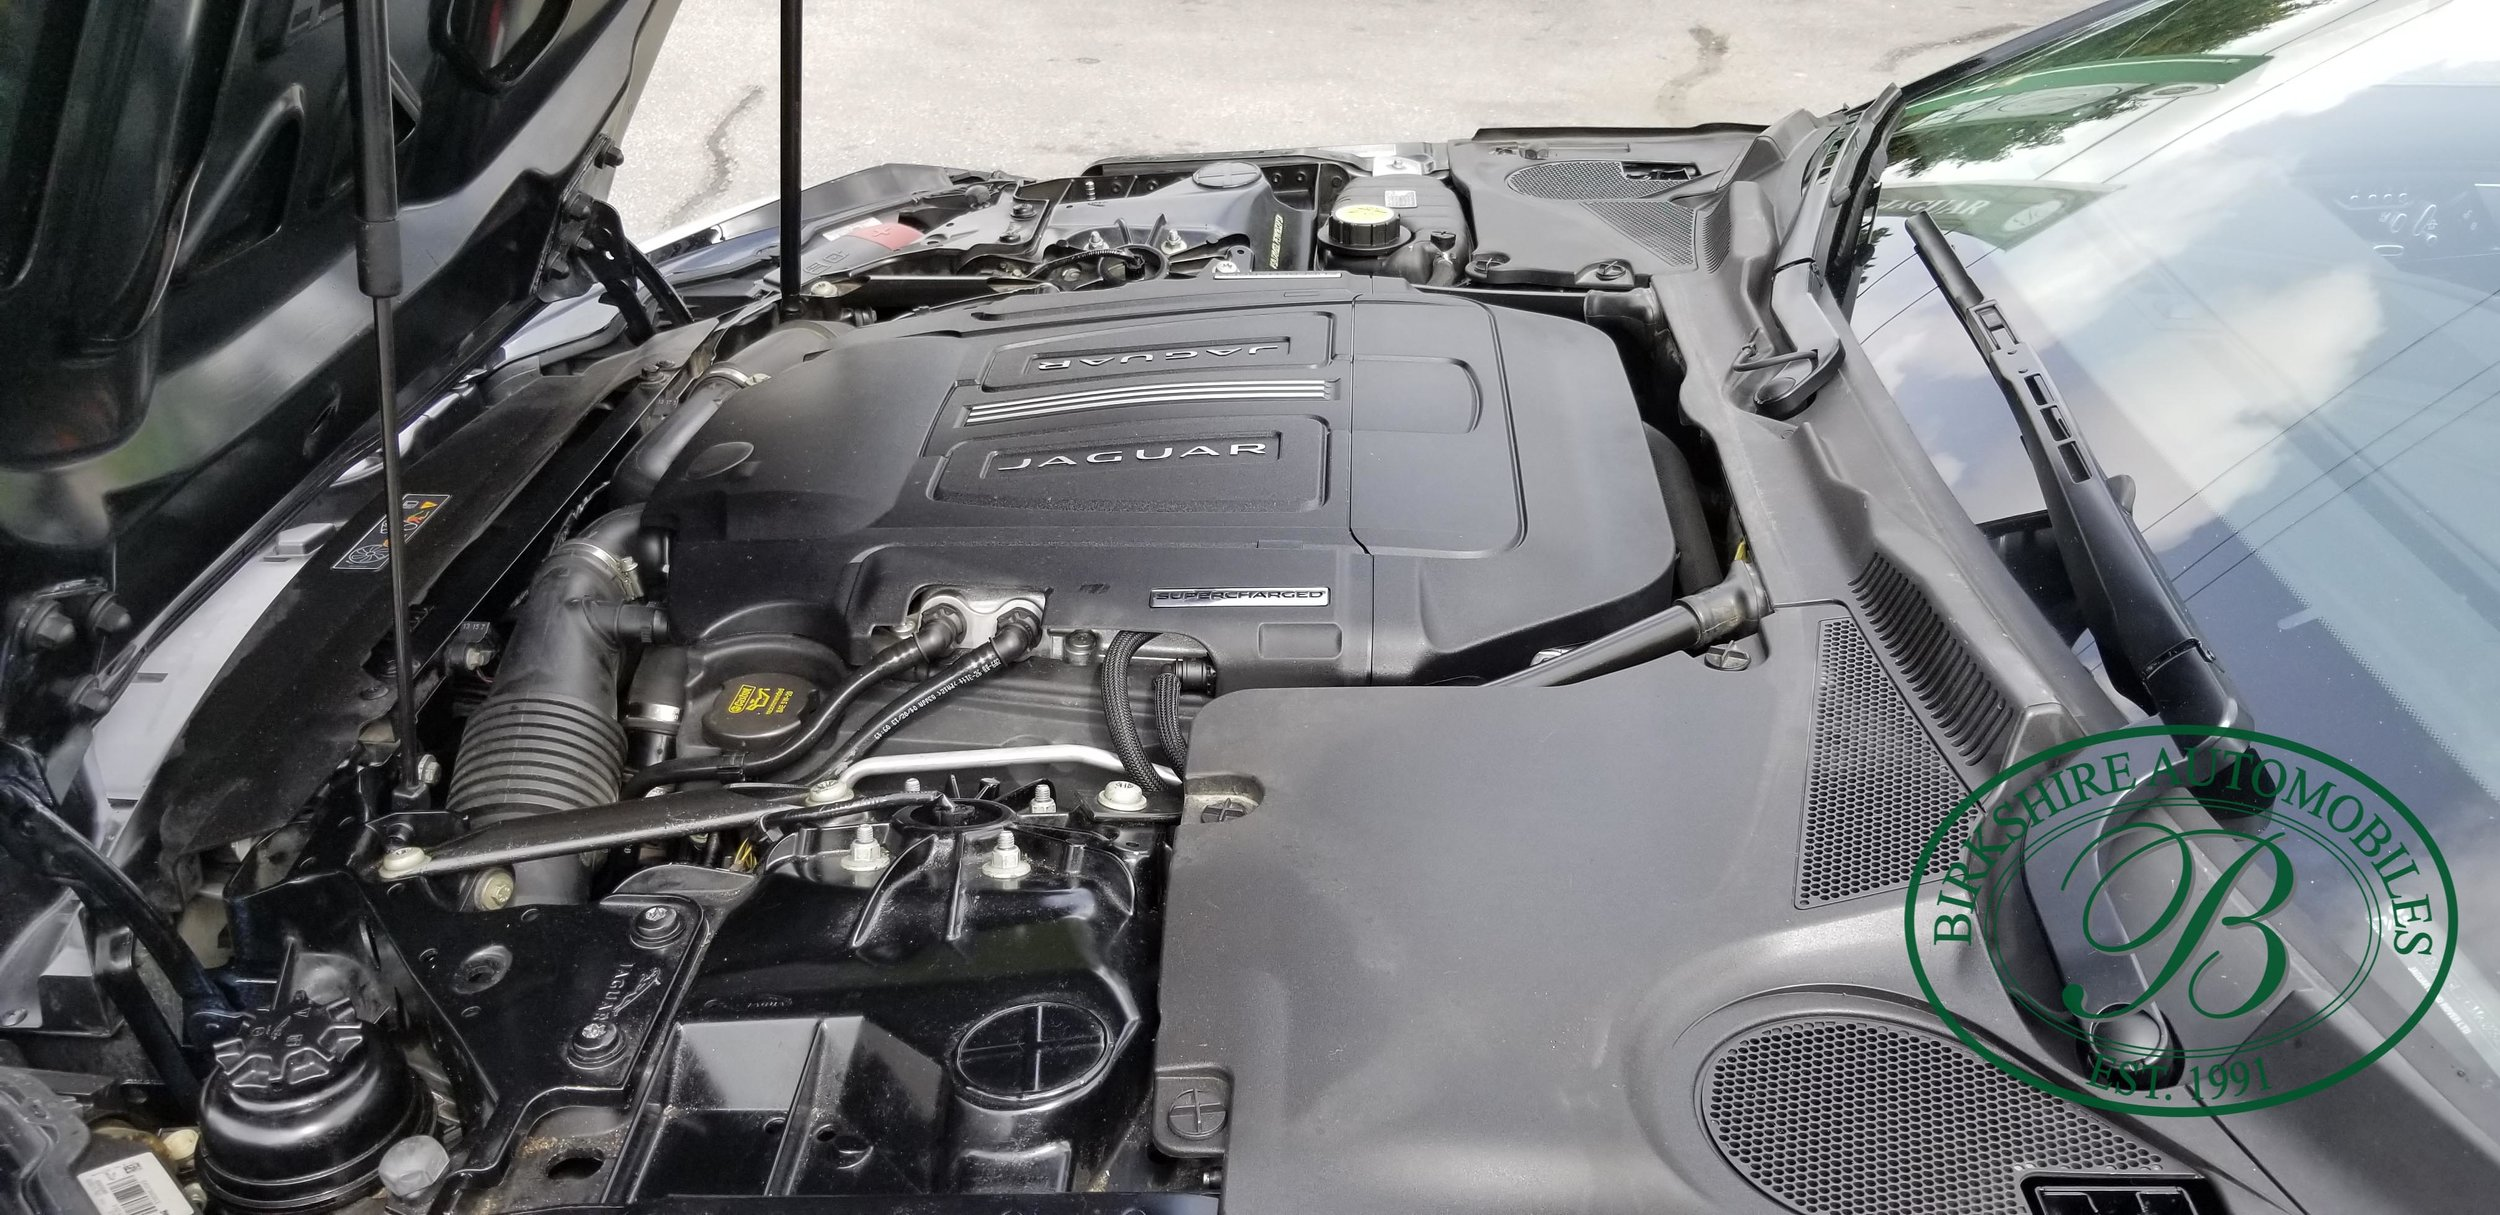 2014 F-Type V8 S - Birkshire Automobiles (5).jpg